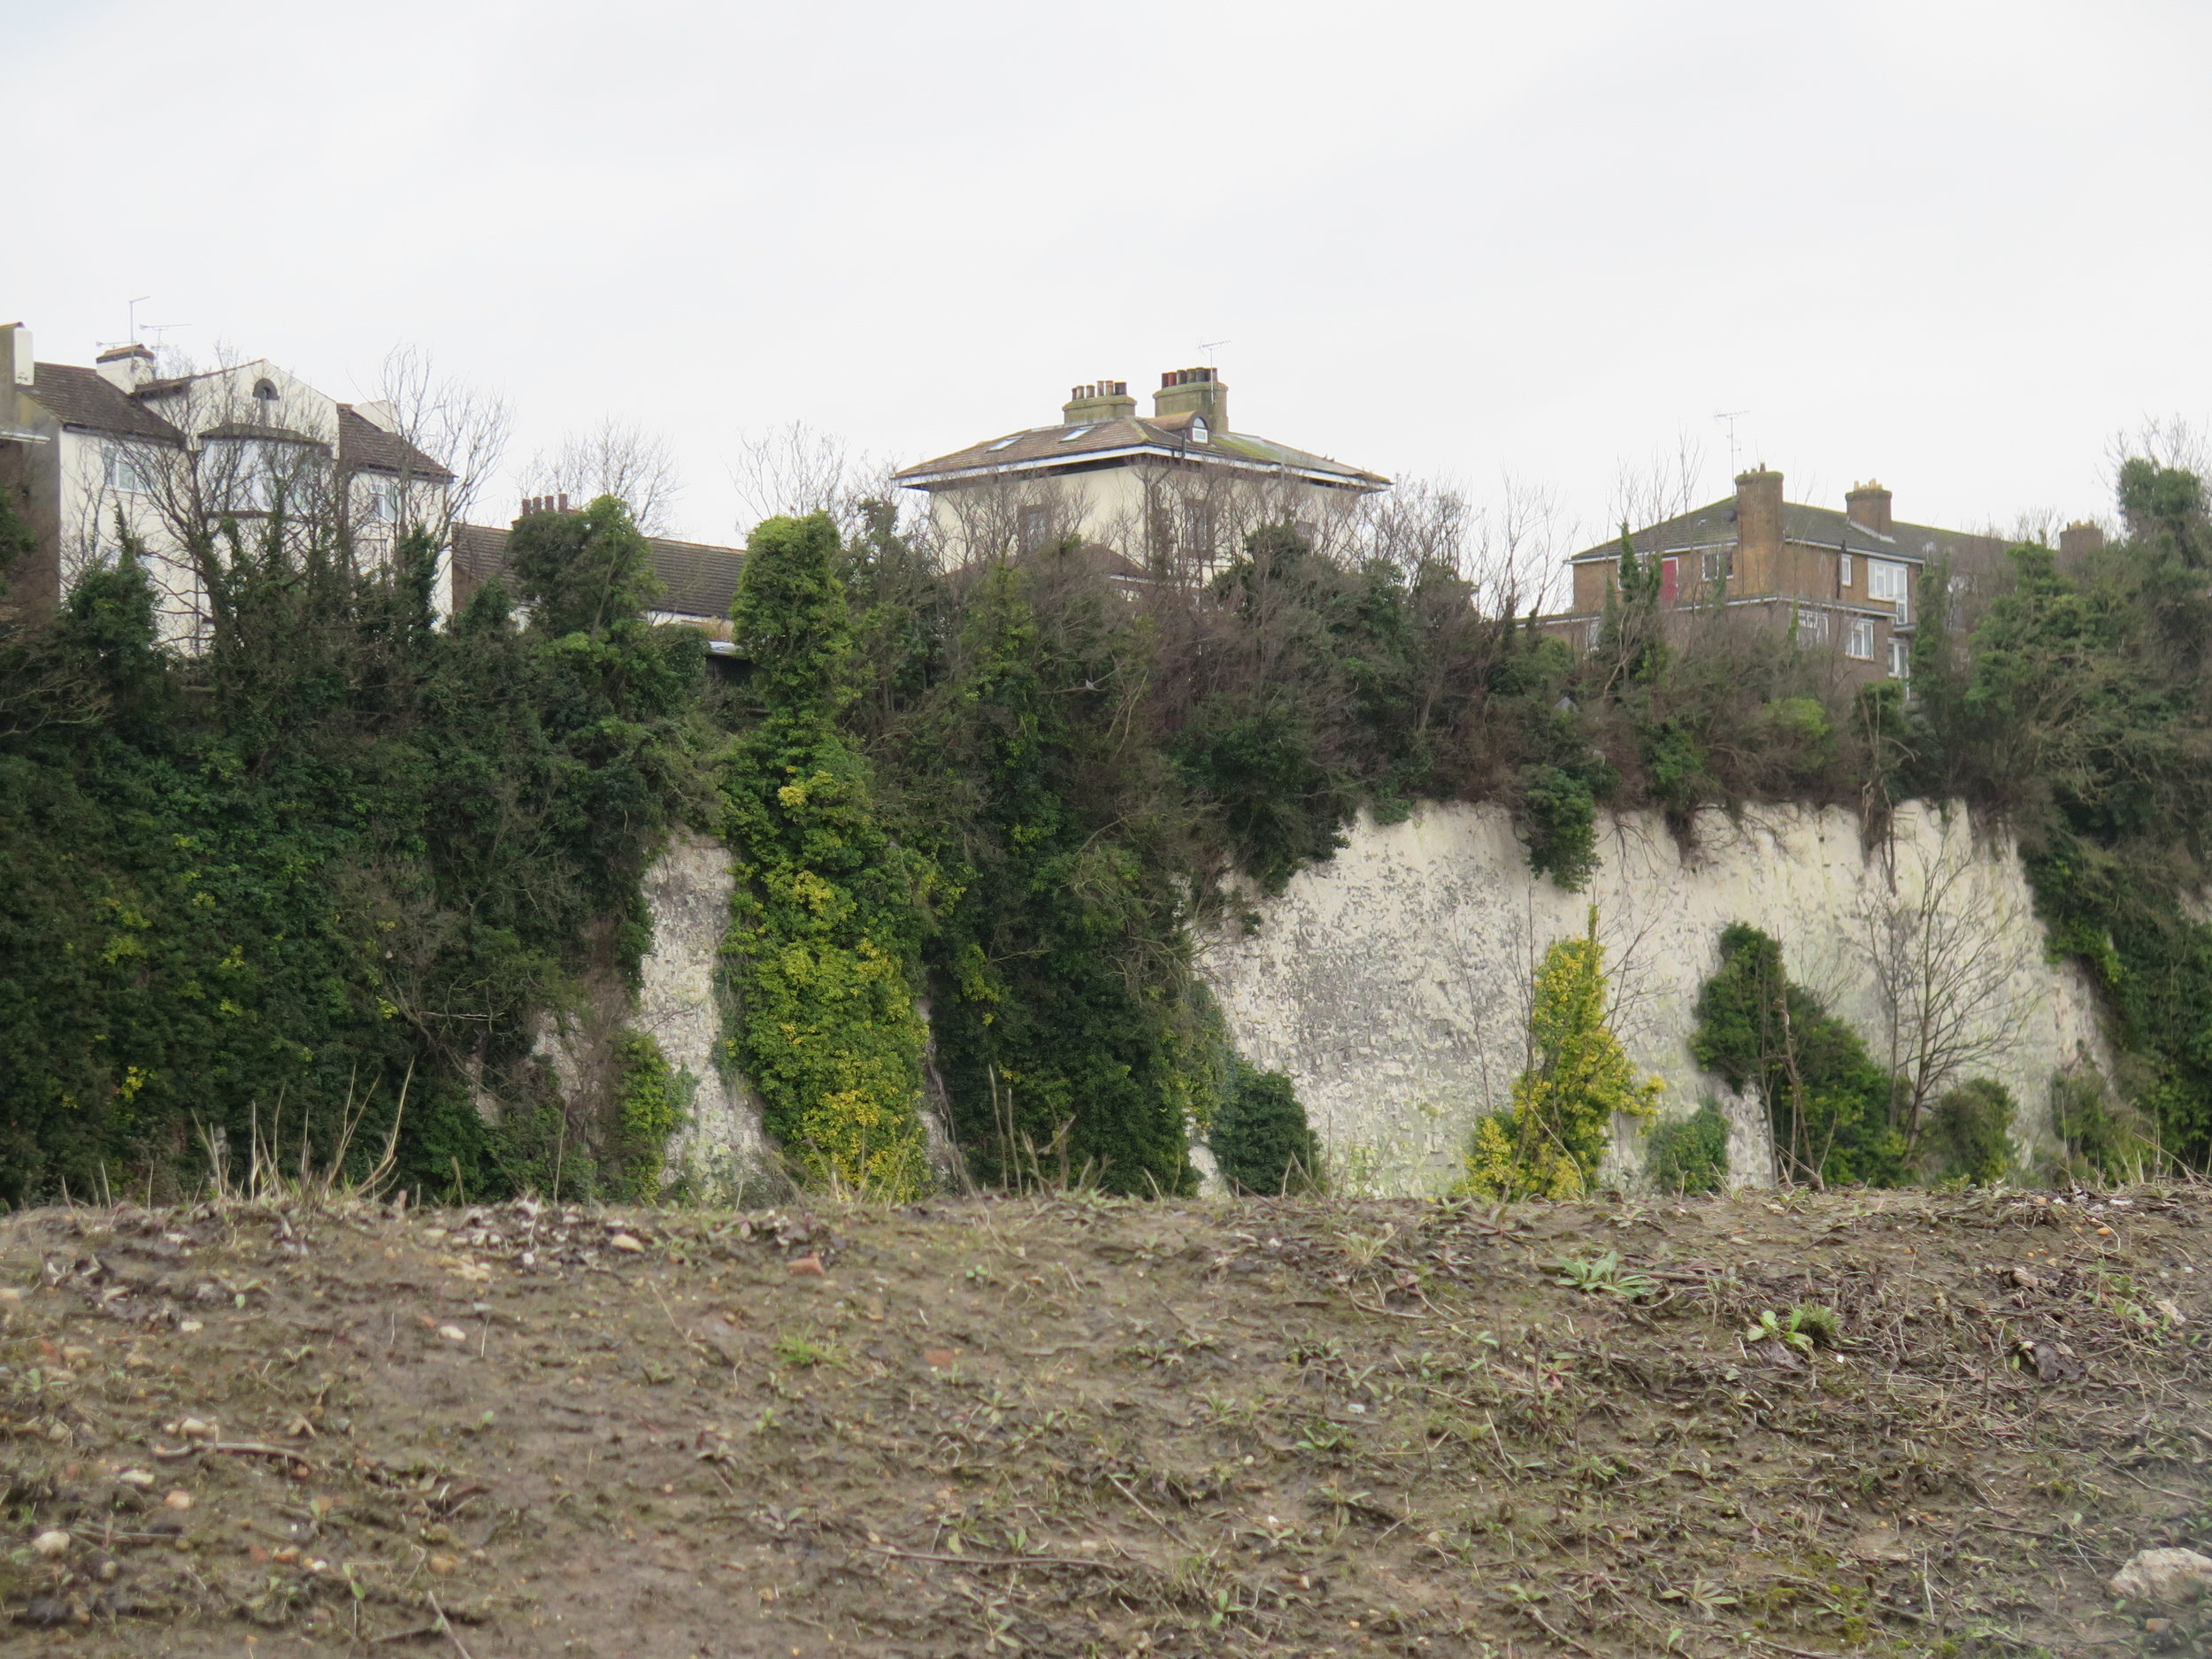 Villas - site of Rosherville Pleasure gardens -